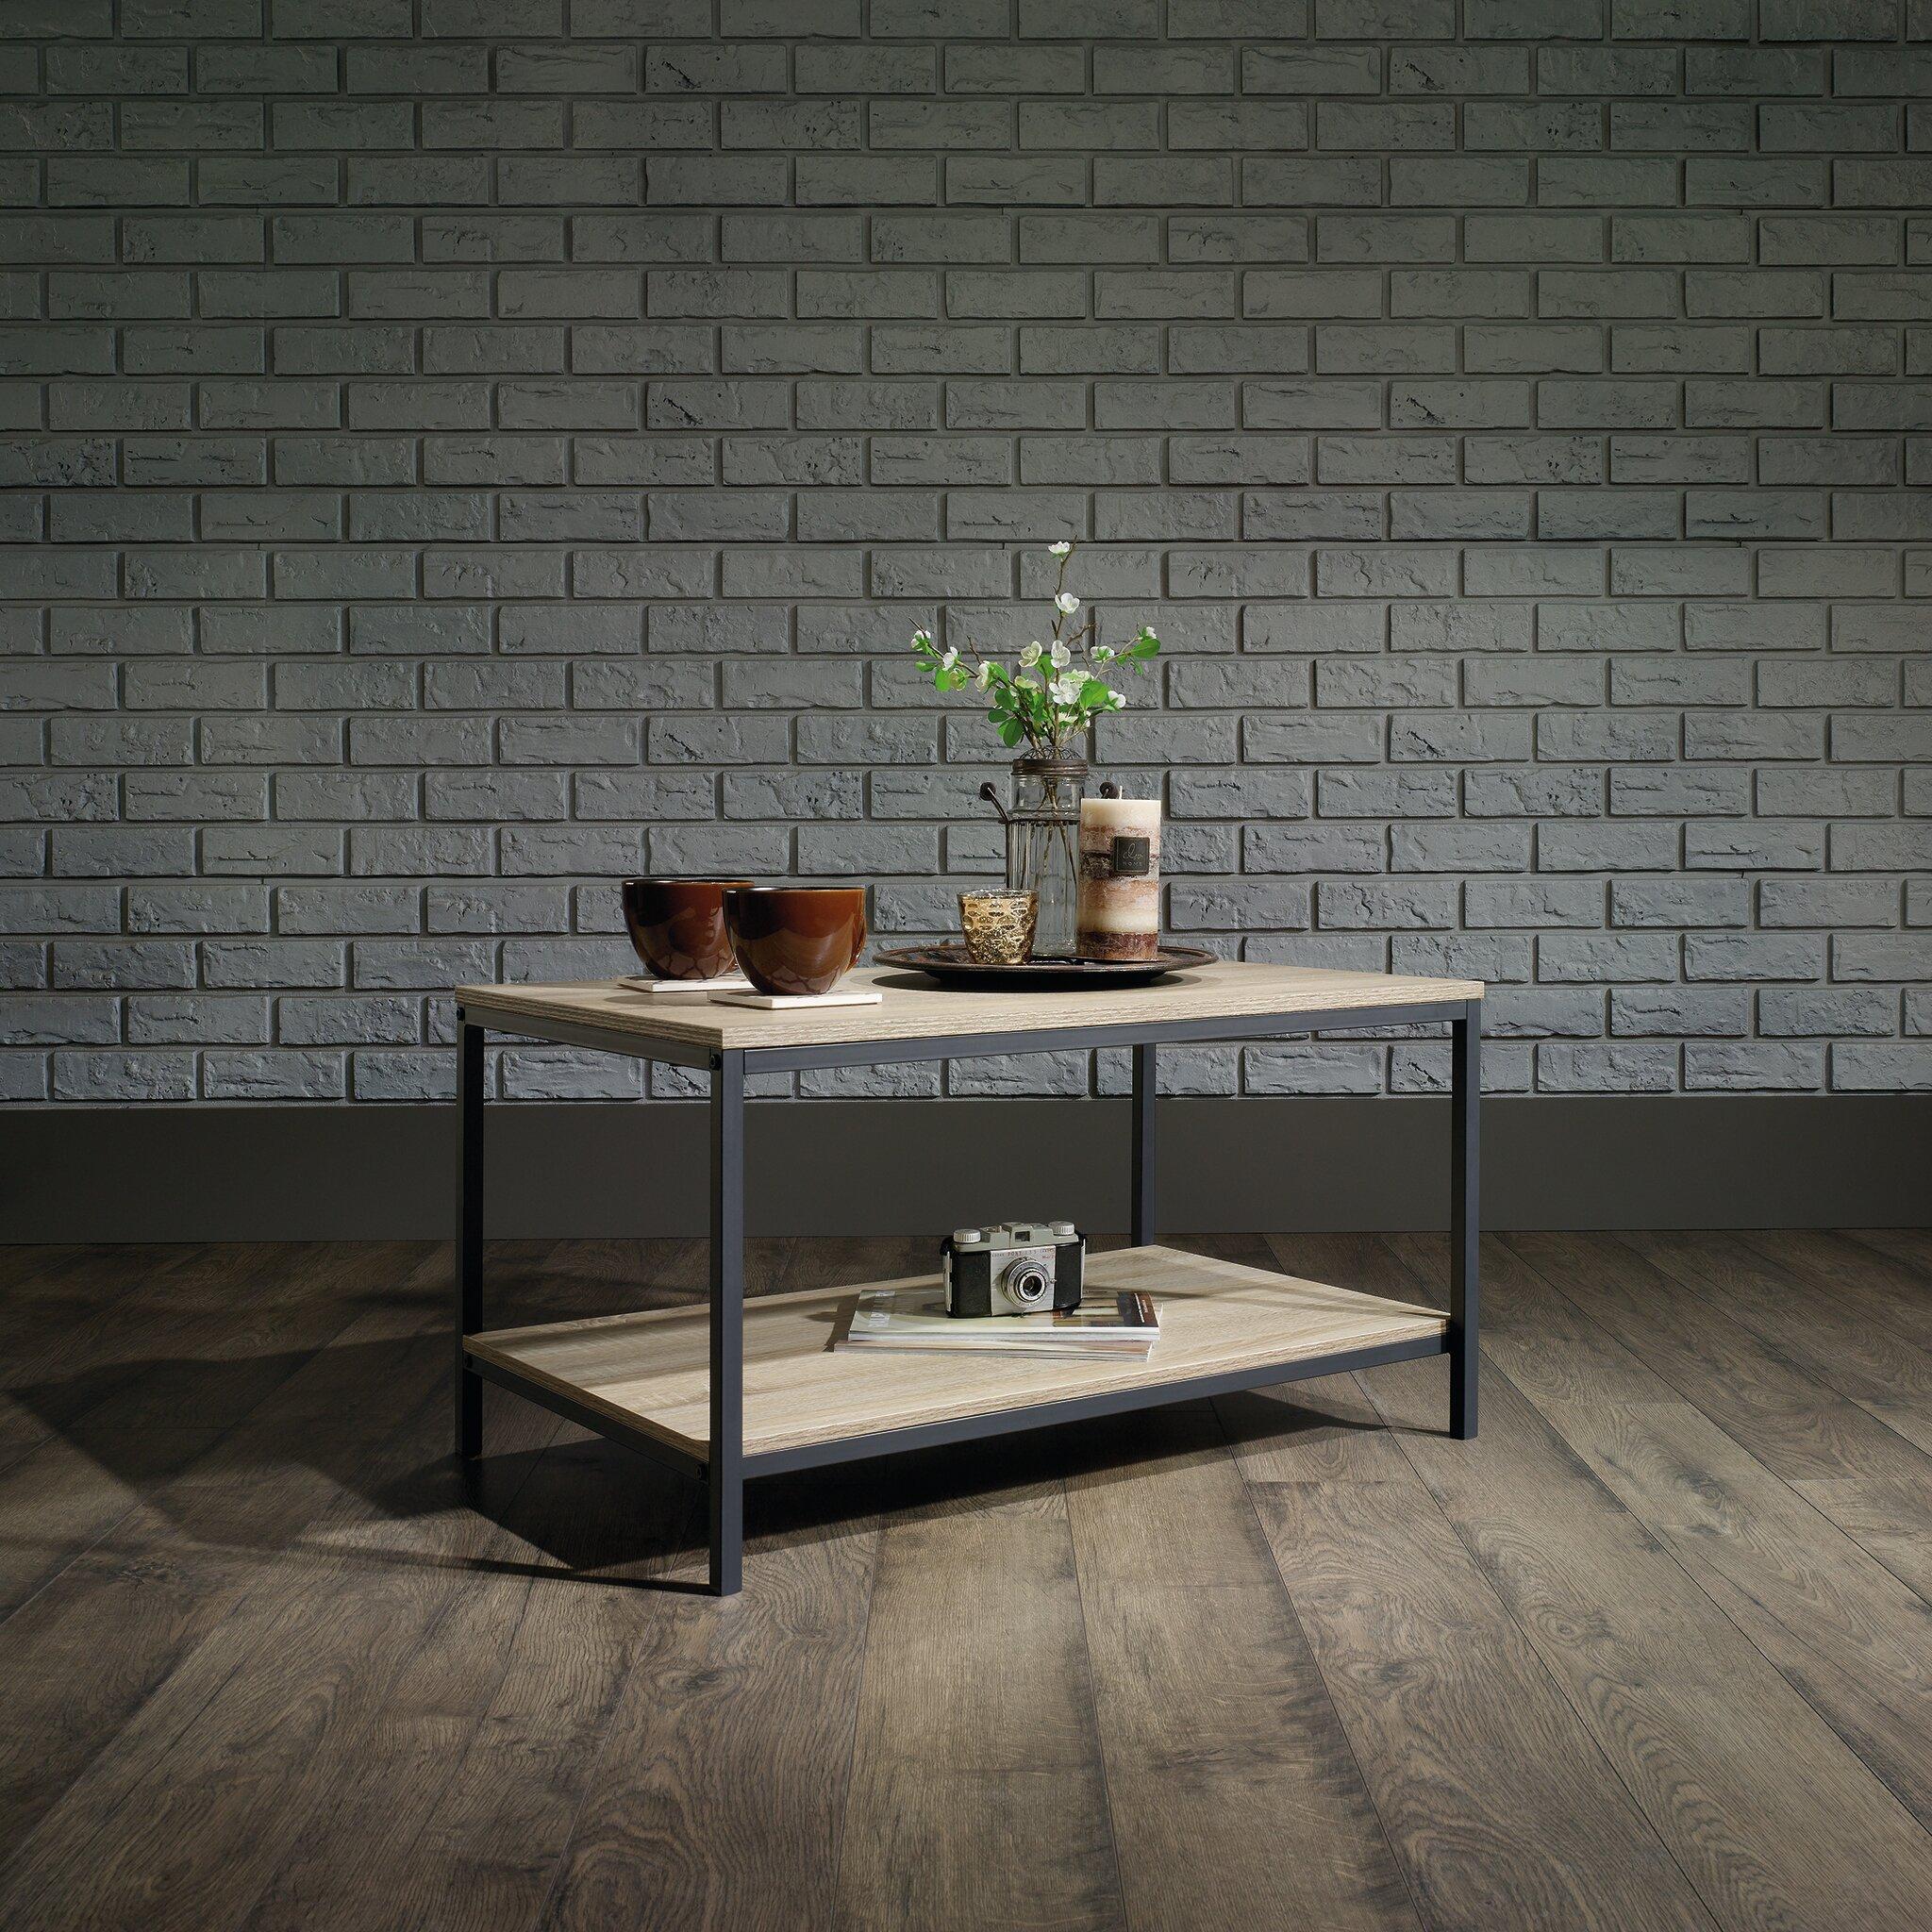 Laurel Foundry Modern Farmhouse Ermont Coffee Table & Reviews | Wayfair